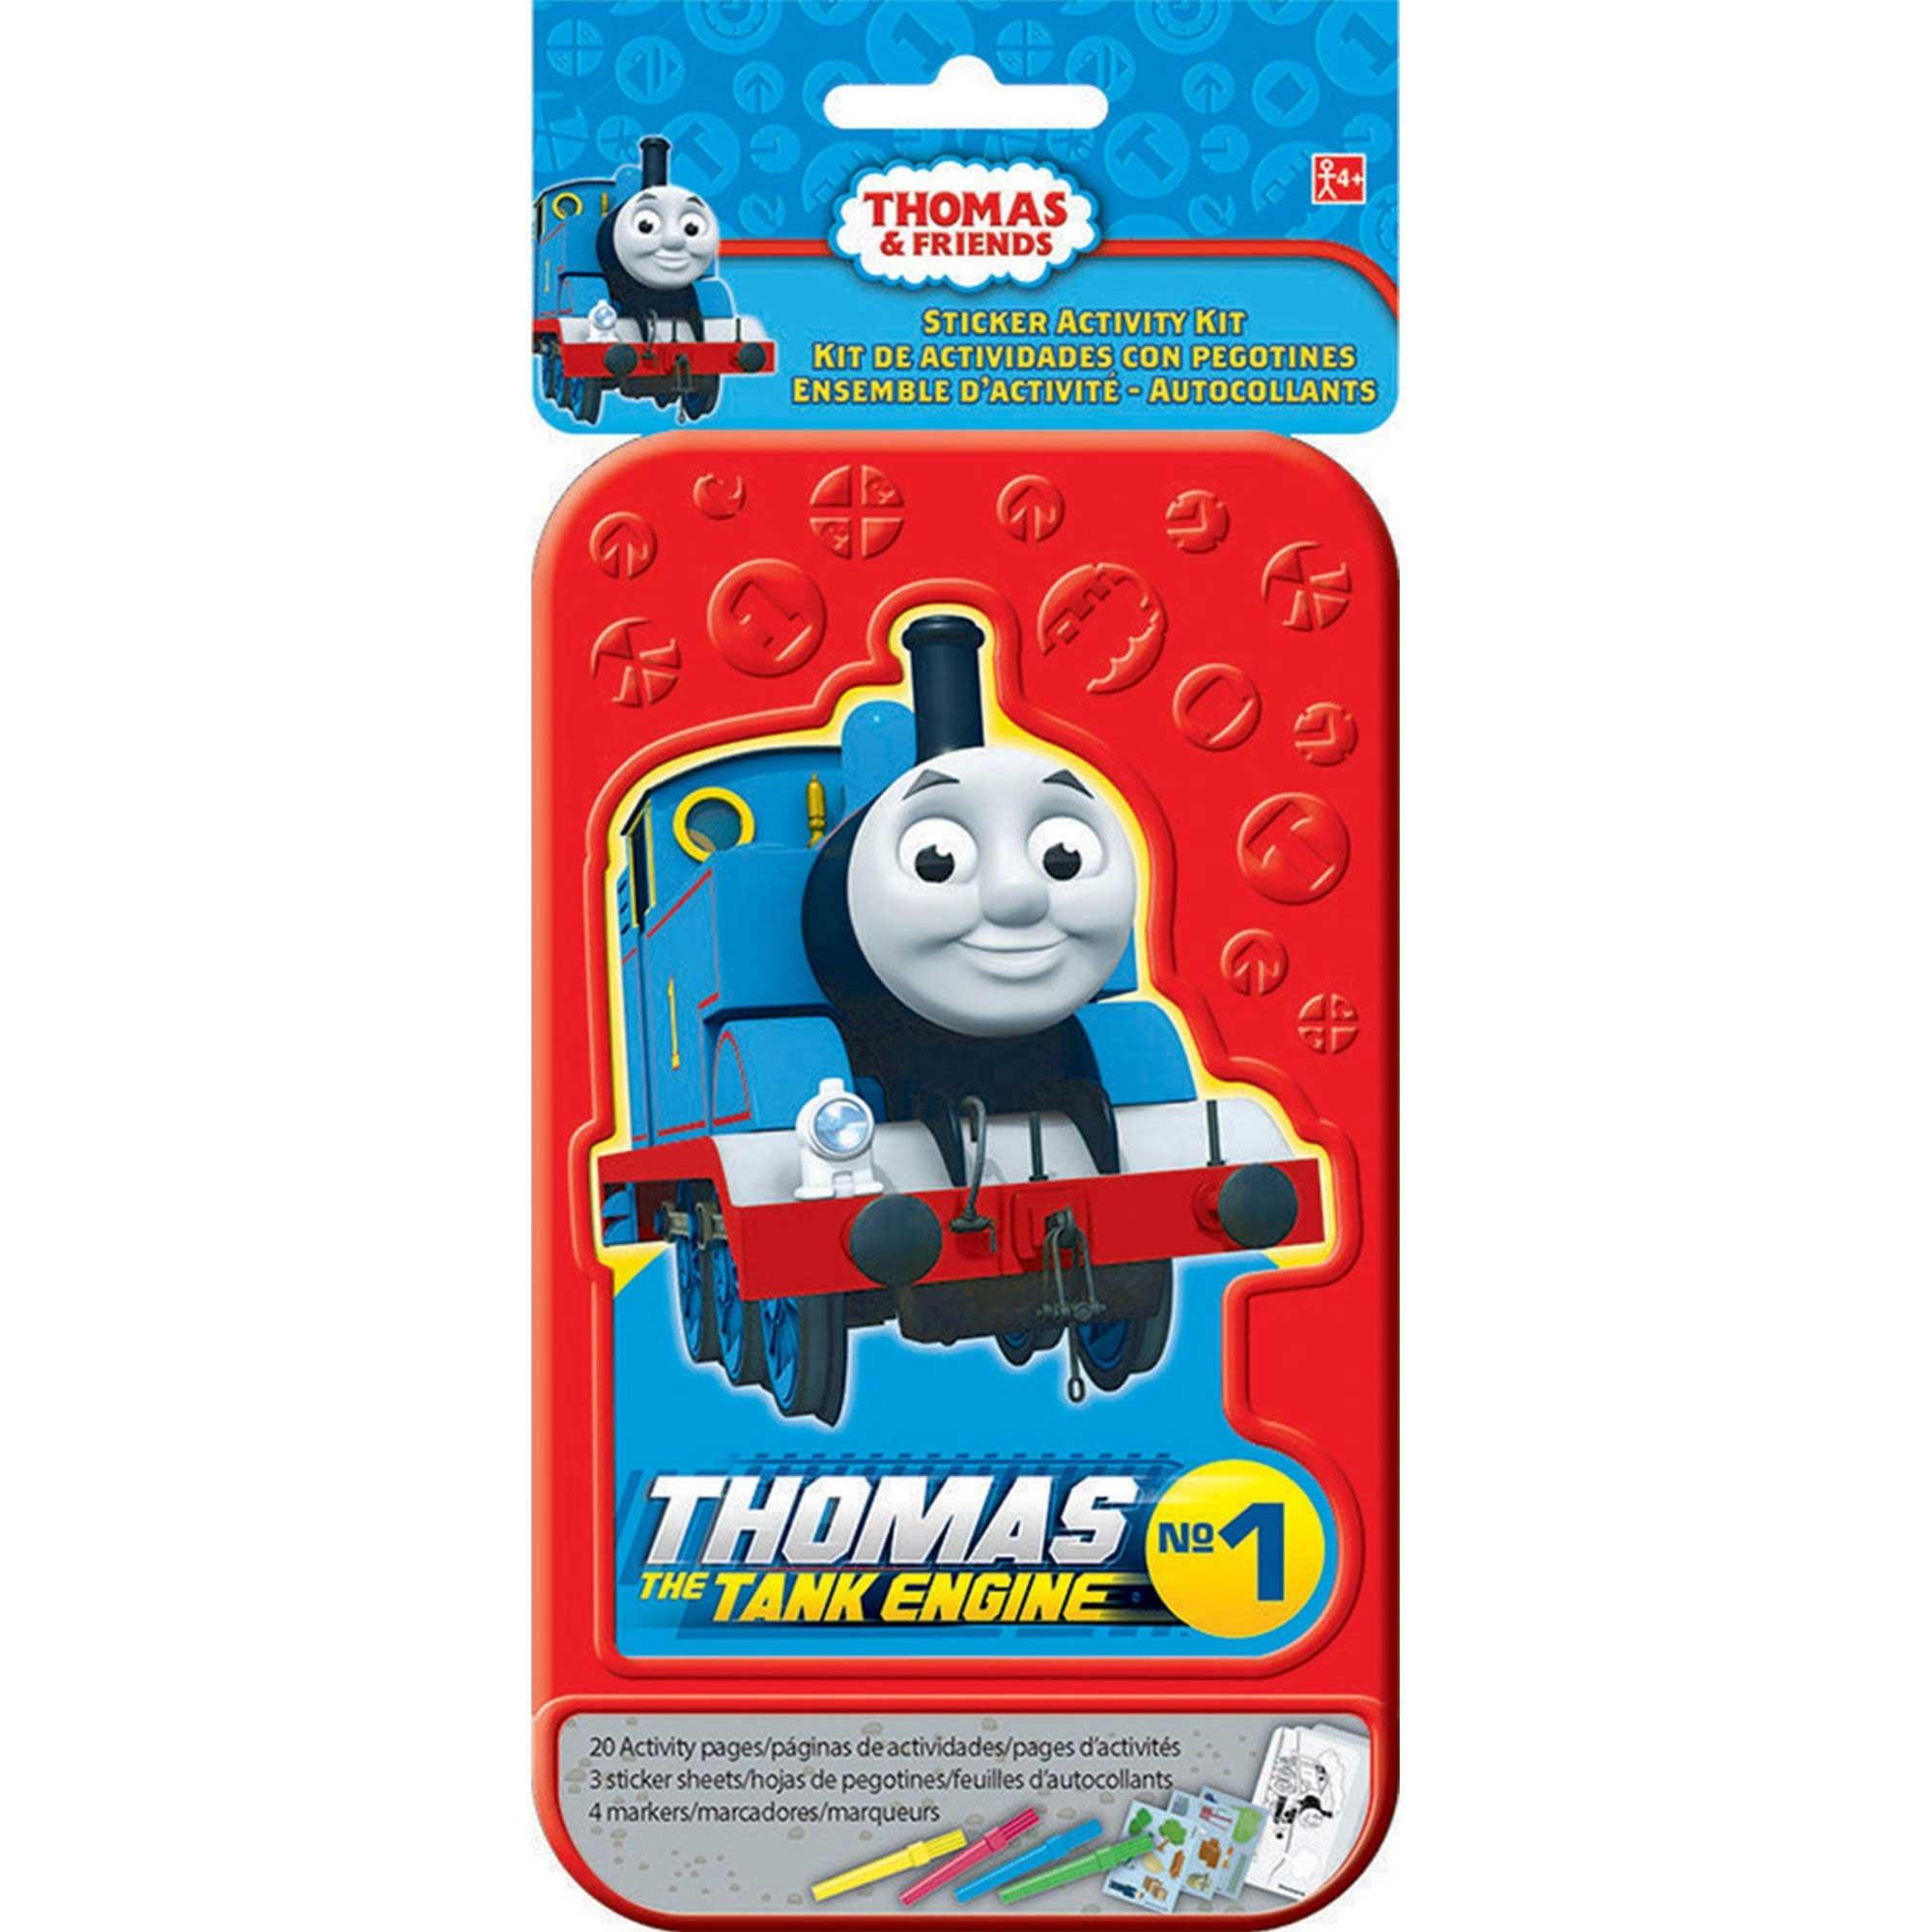 Sticker Activity Kit Thomas & Friends